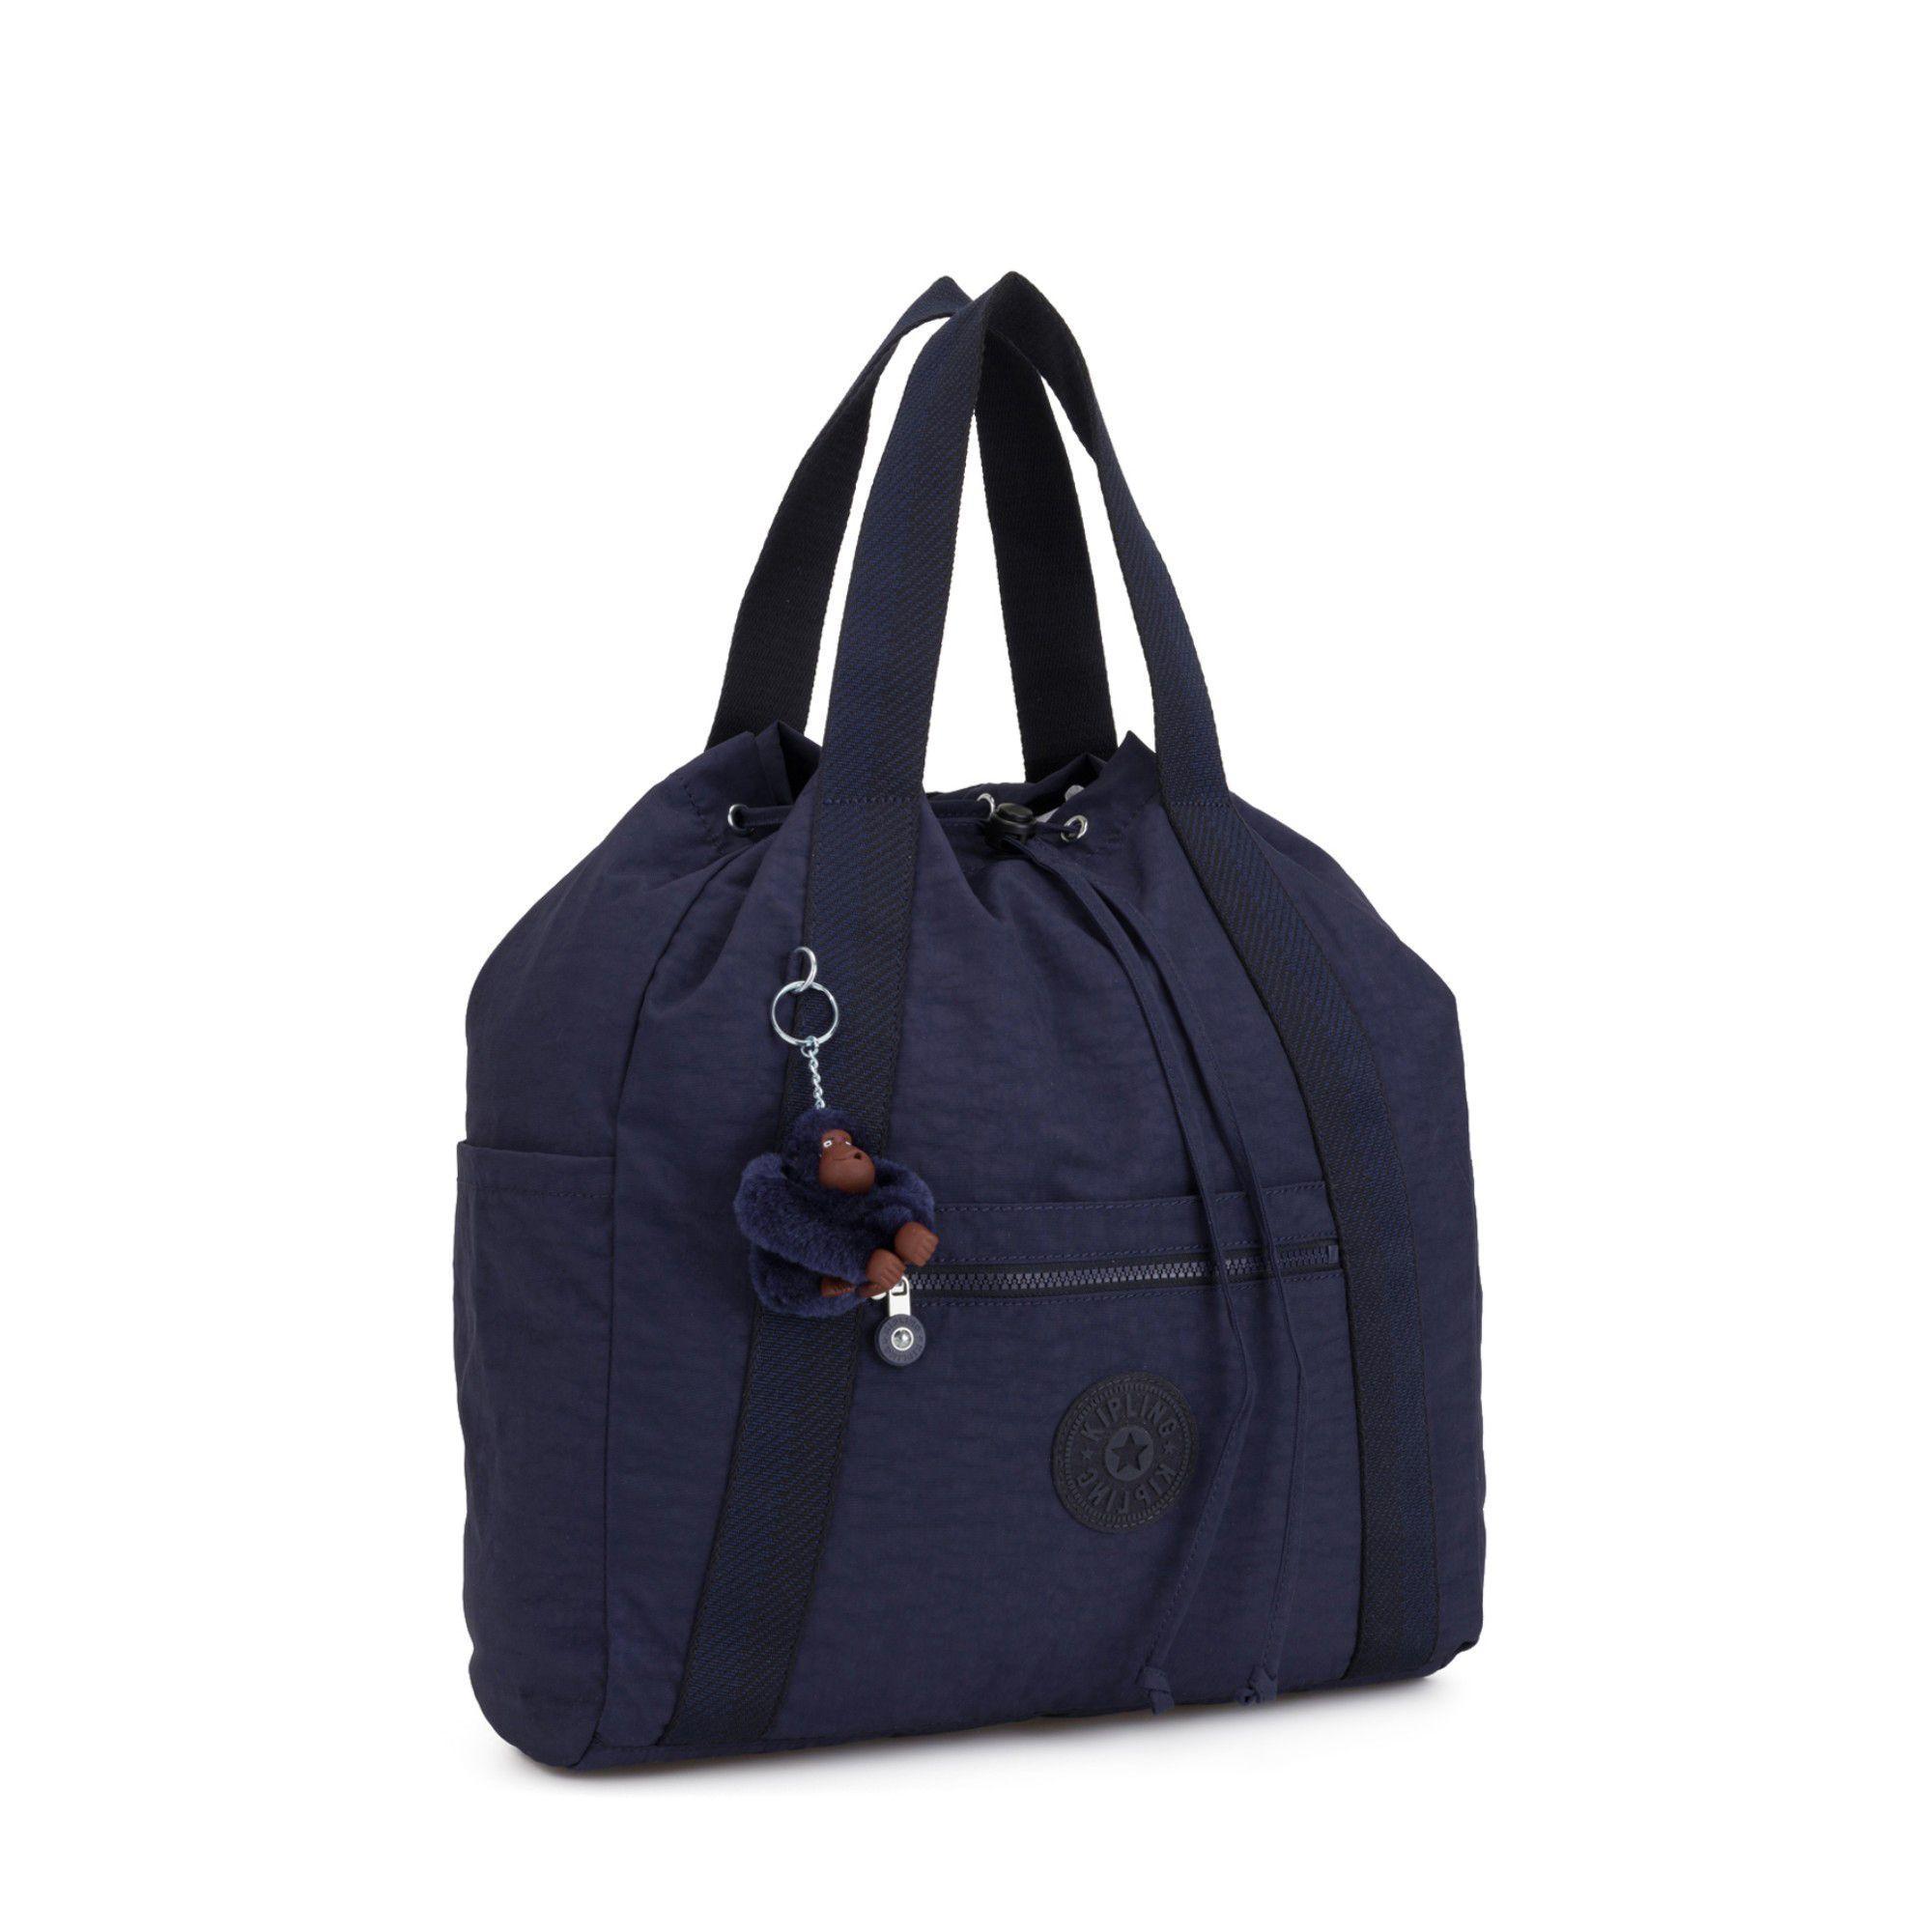 c90cad2a3f Kipling - Dark Blue 'art M' Travel Trolley Sleeve Tote Bag - Lyst. View  fullscreen